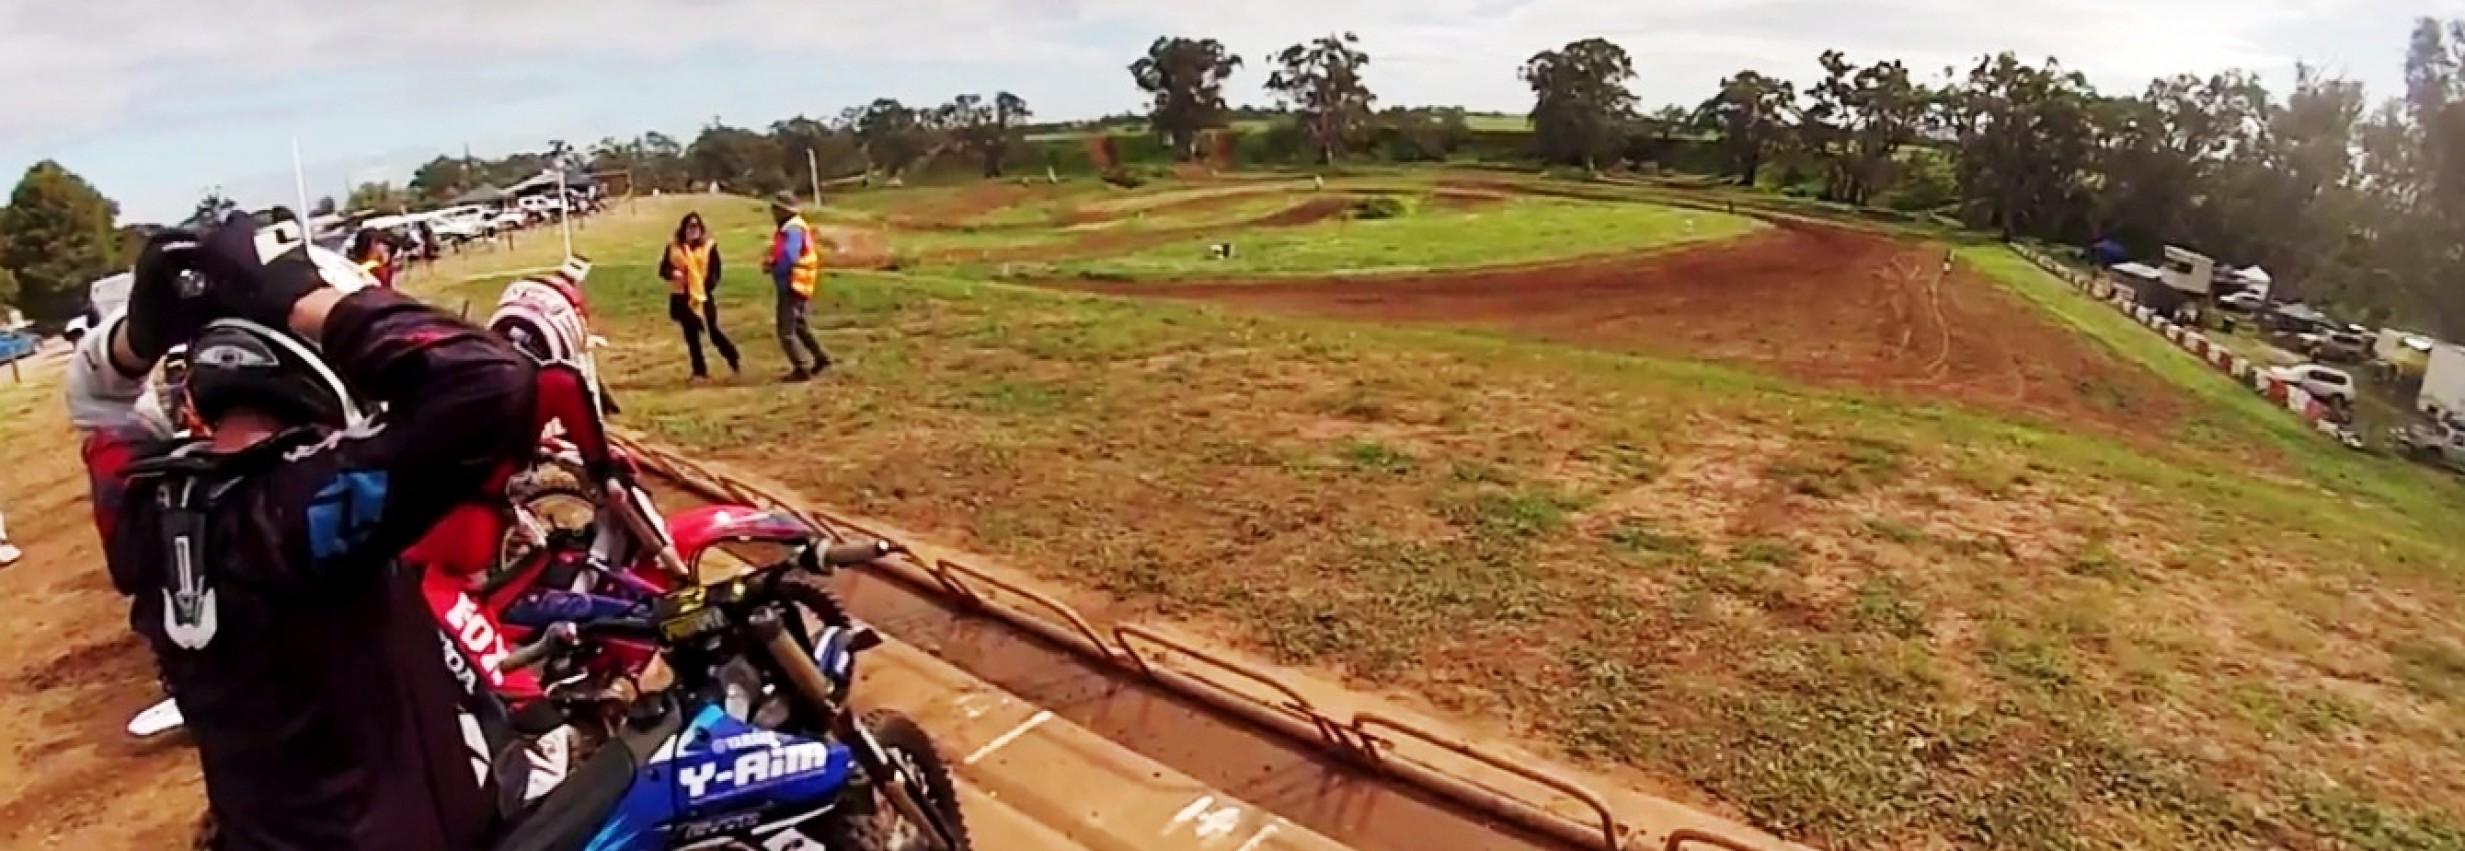 Crystal Brook Motocross Track – Crystal Brook Motorcycle Club